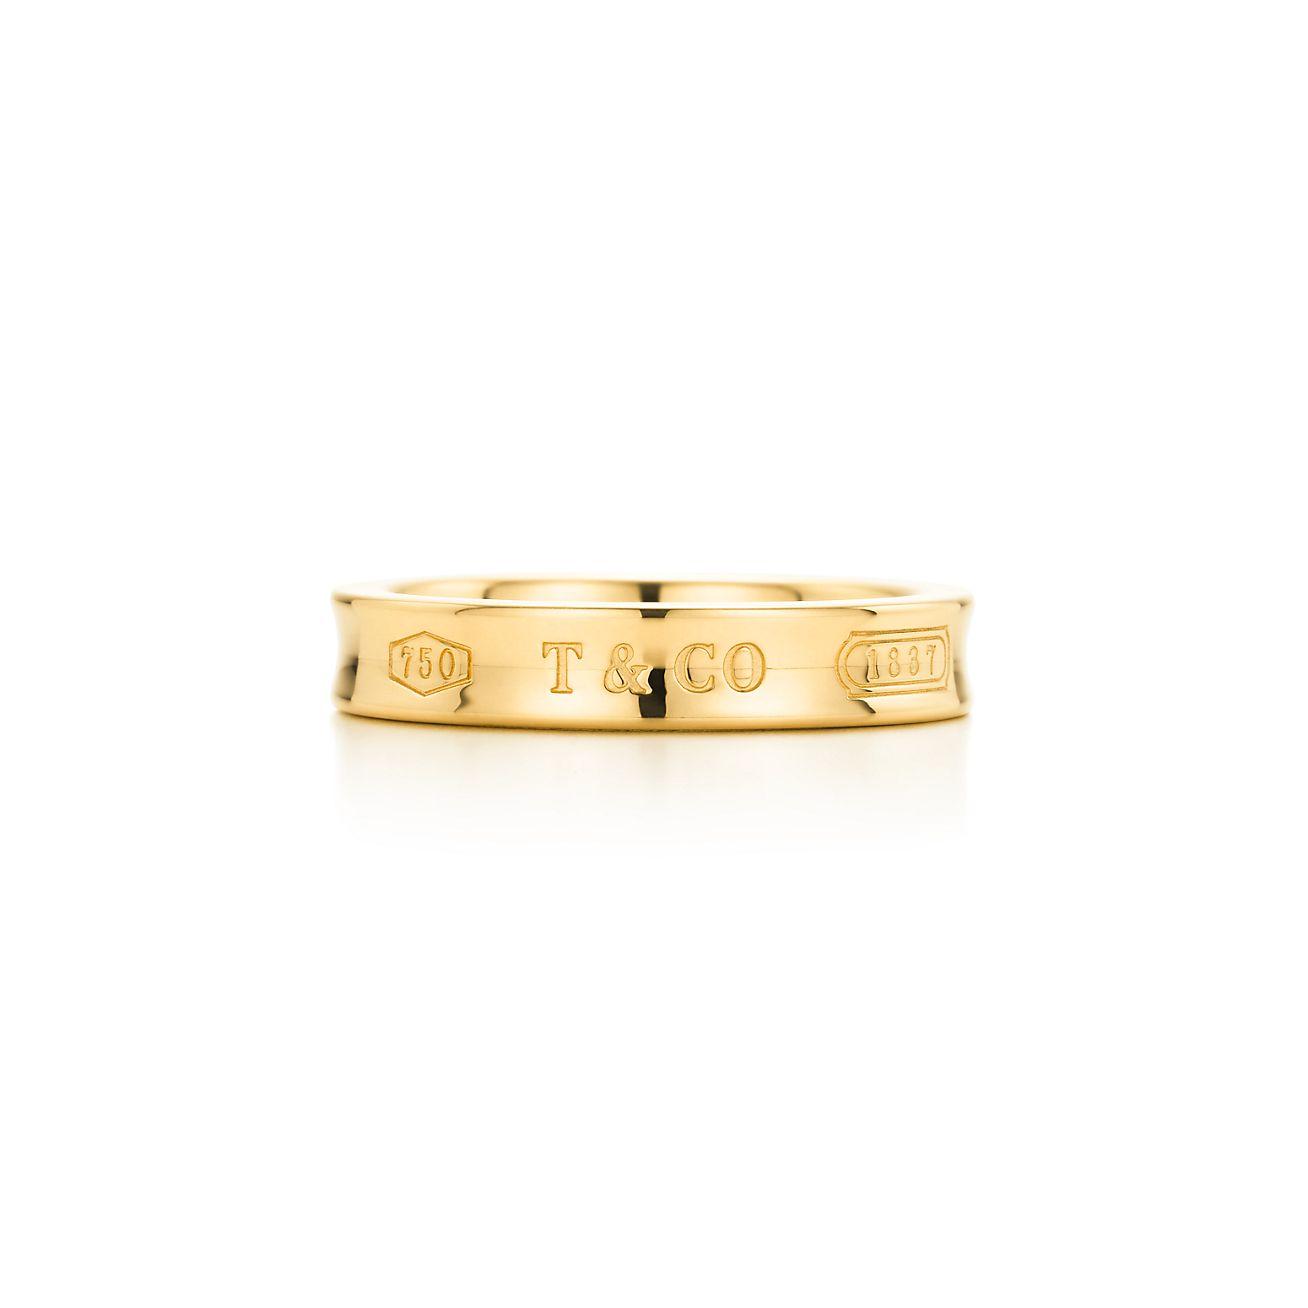 Tiffany 1837 wide ring in Rubedo metal - Size 6 1/2 Tiffany & Co.